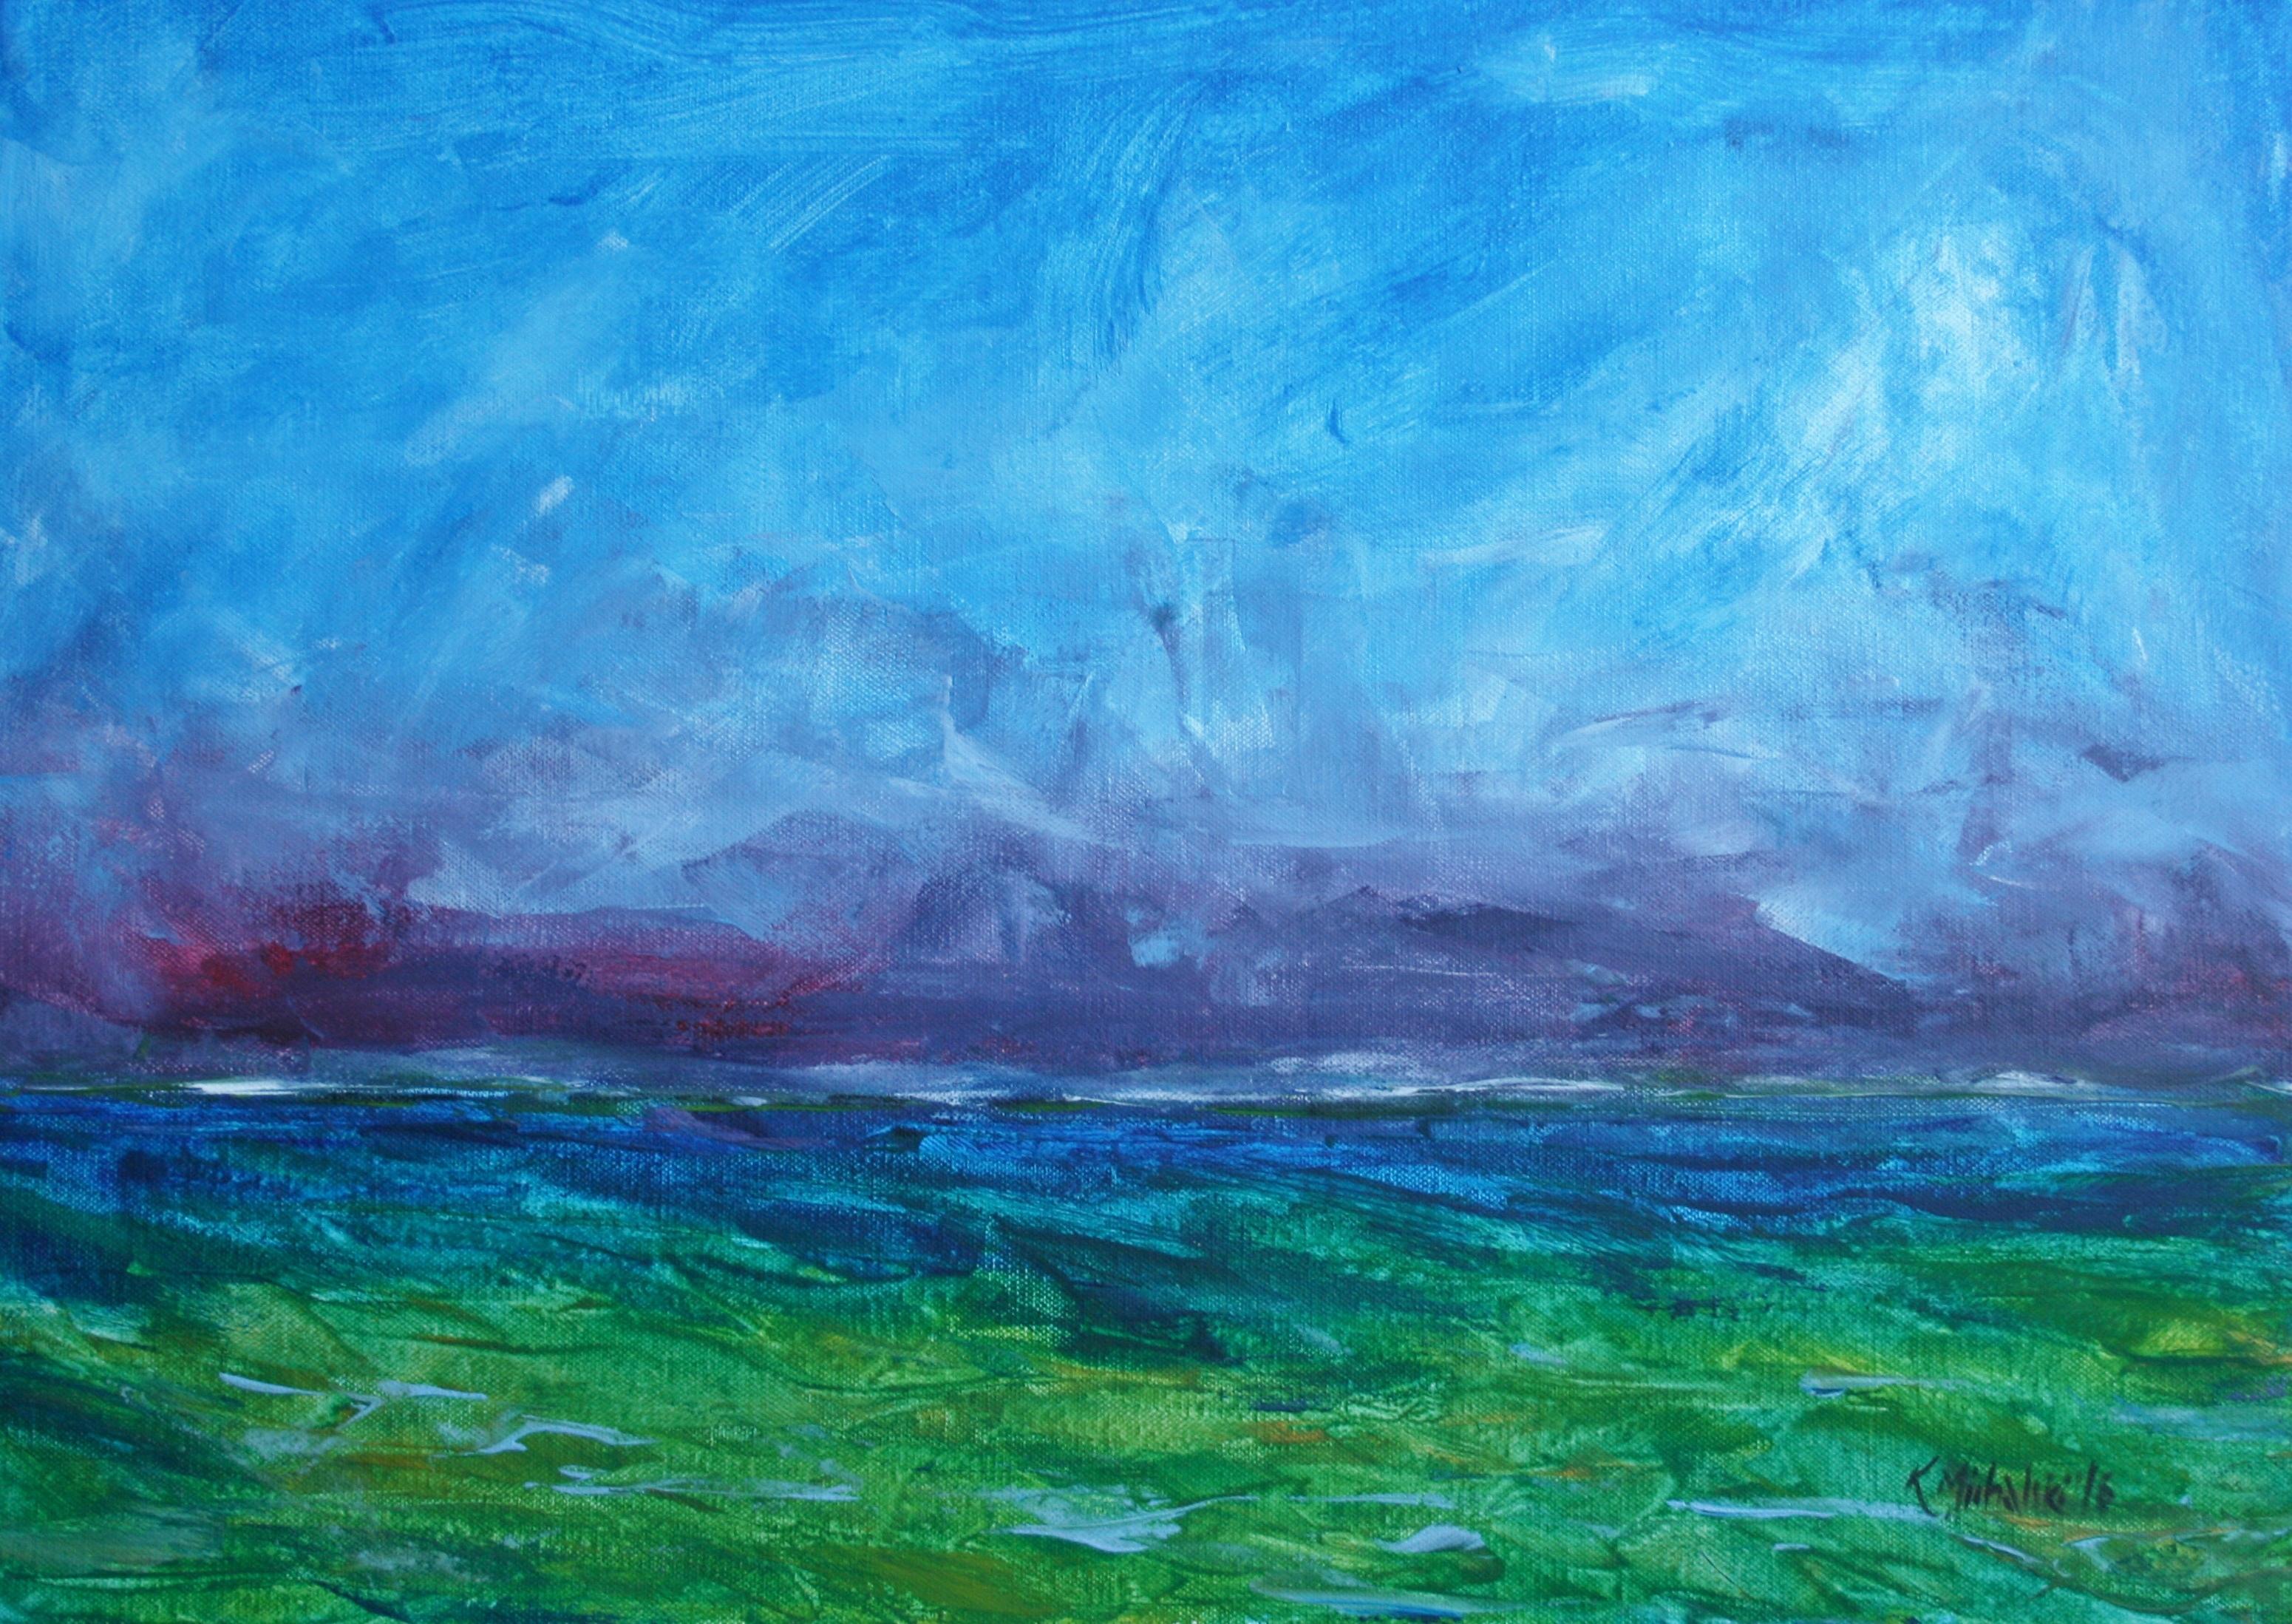 Meereslicht, 2016, 50 x 70, Acryl auf Leinwand